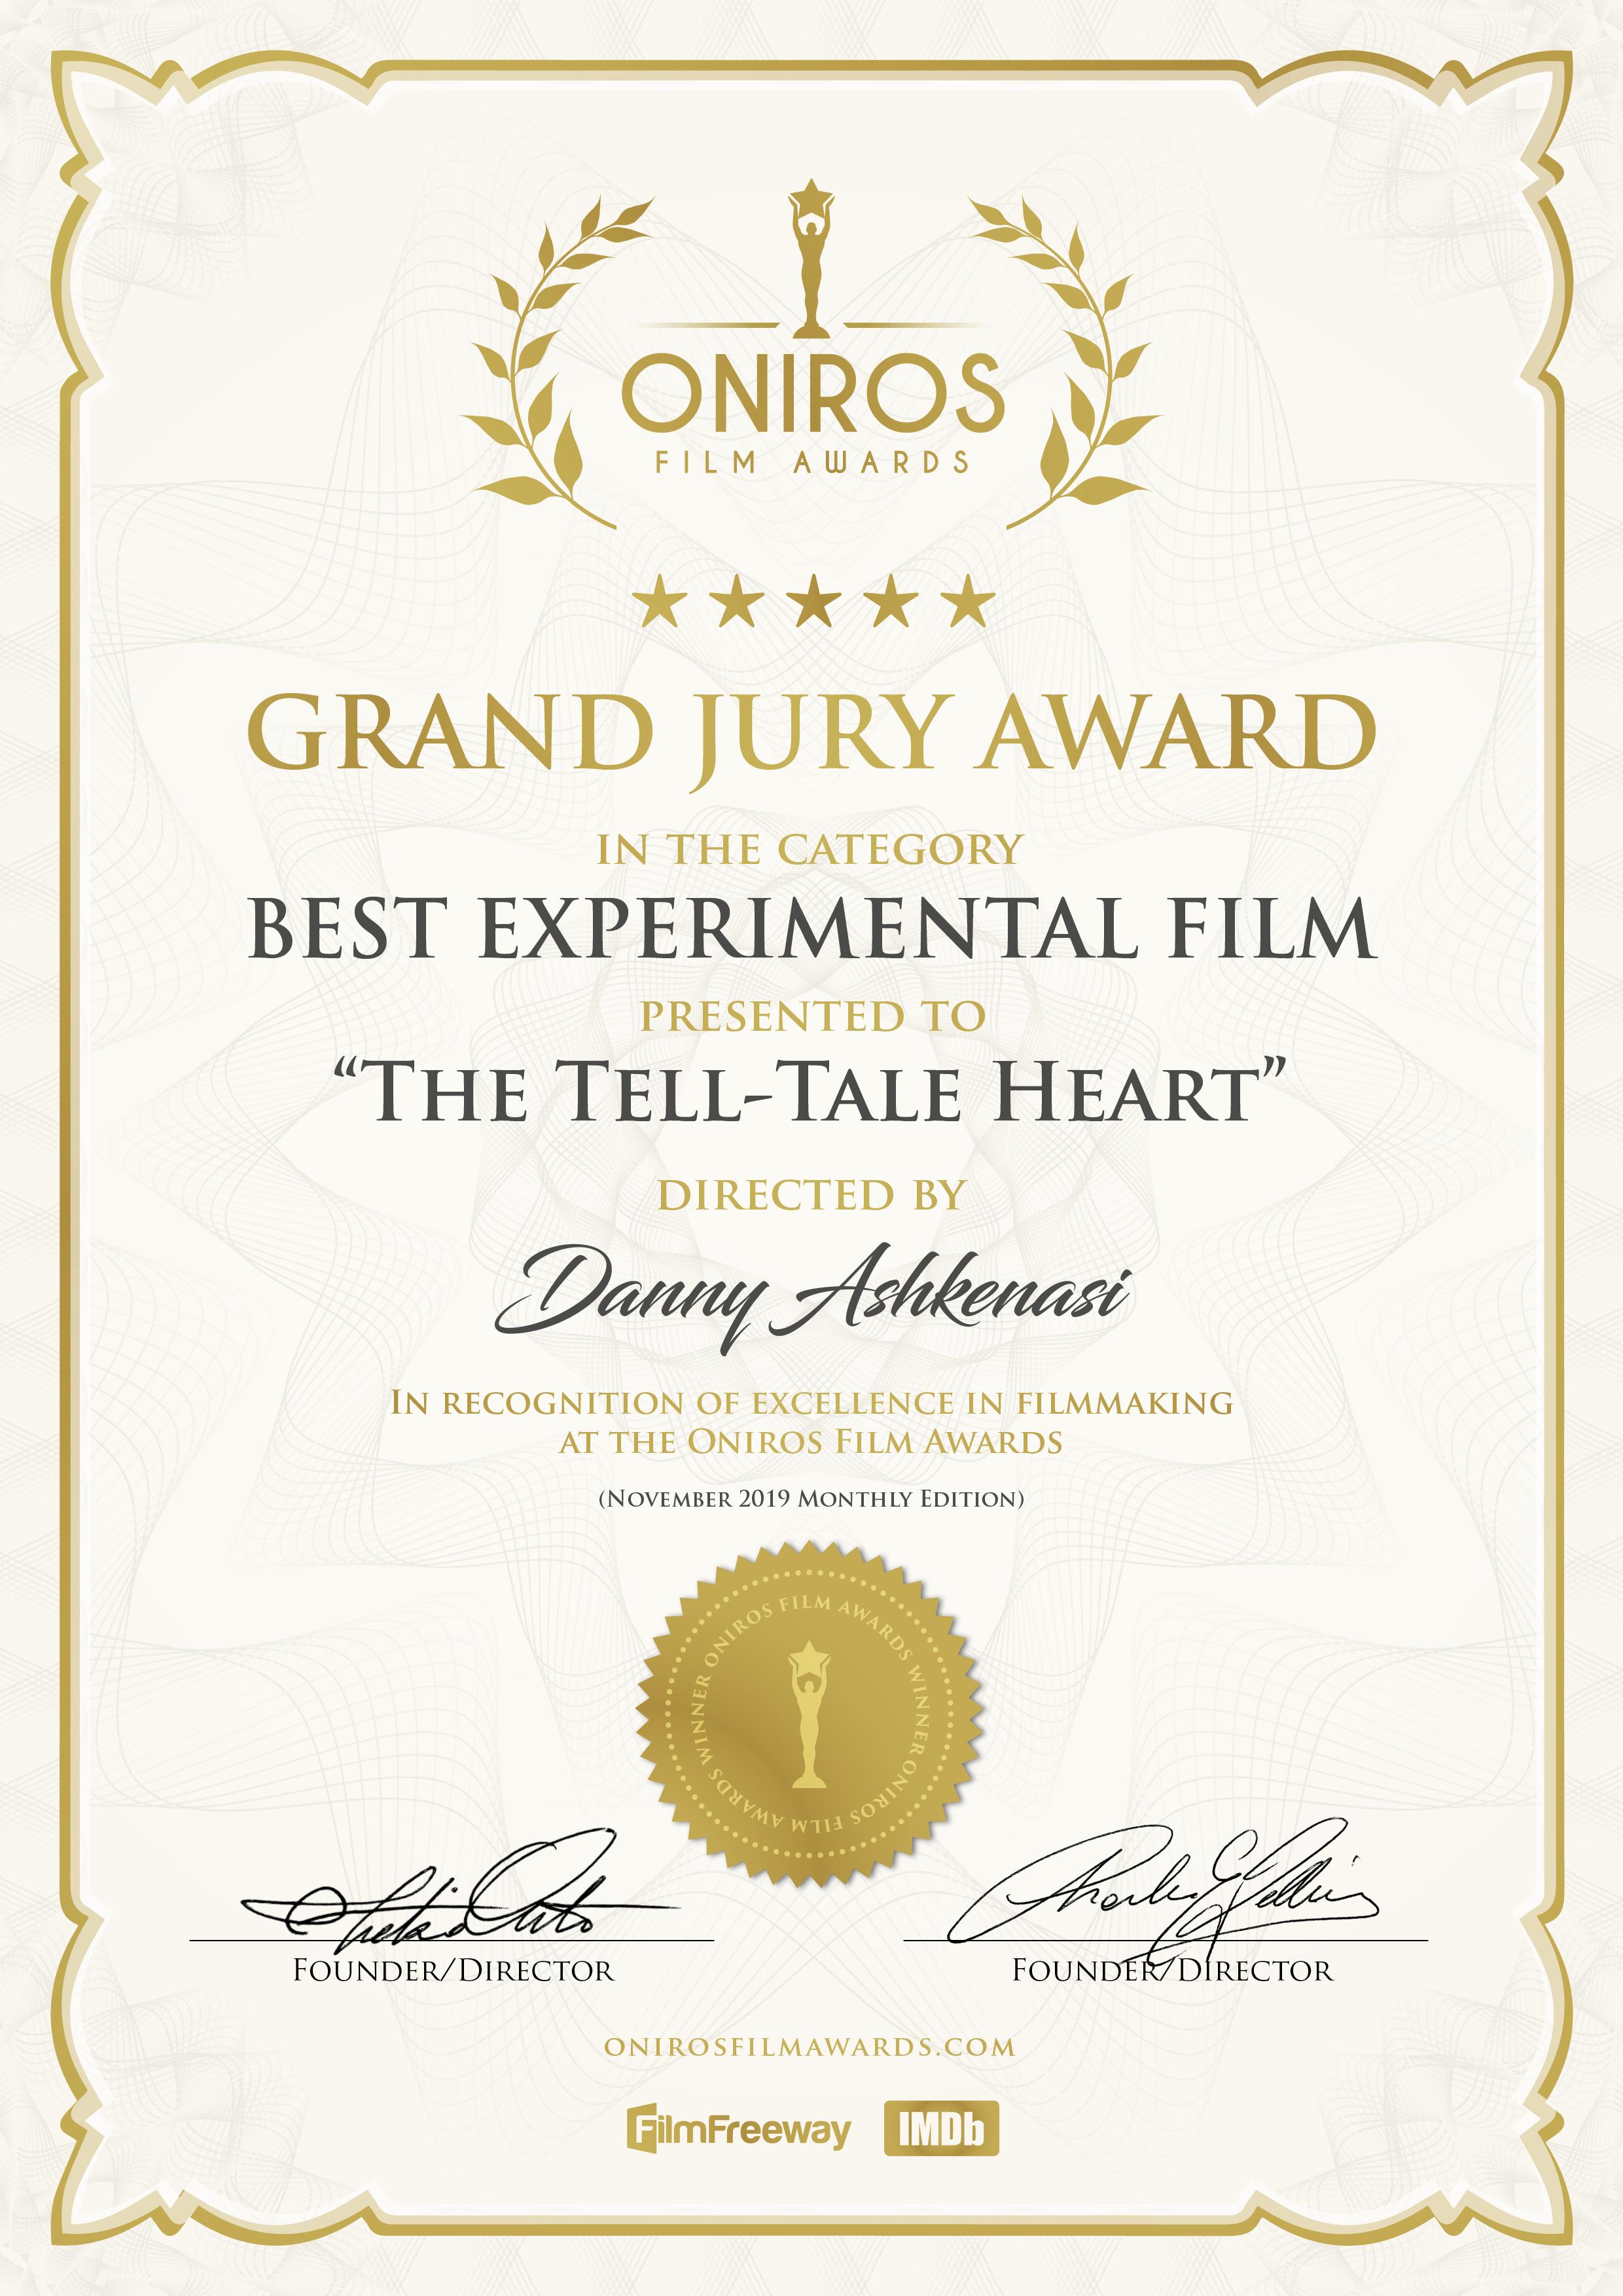 Oniros Grand Jury Award The Tell-Tale Heart